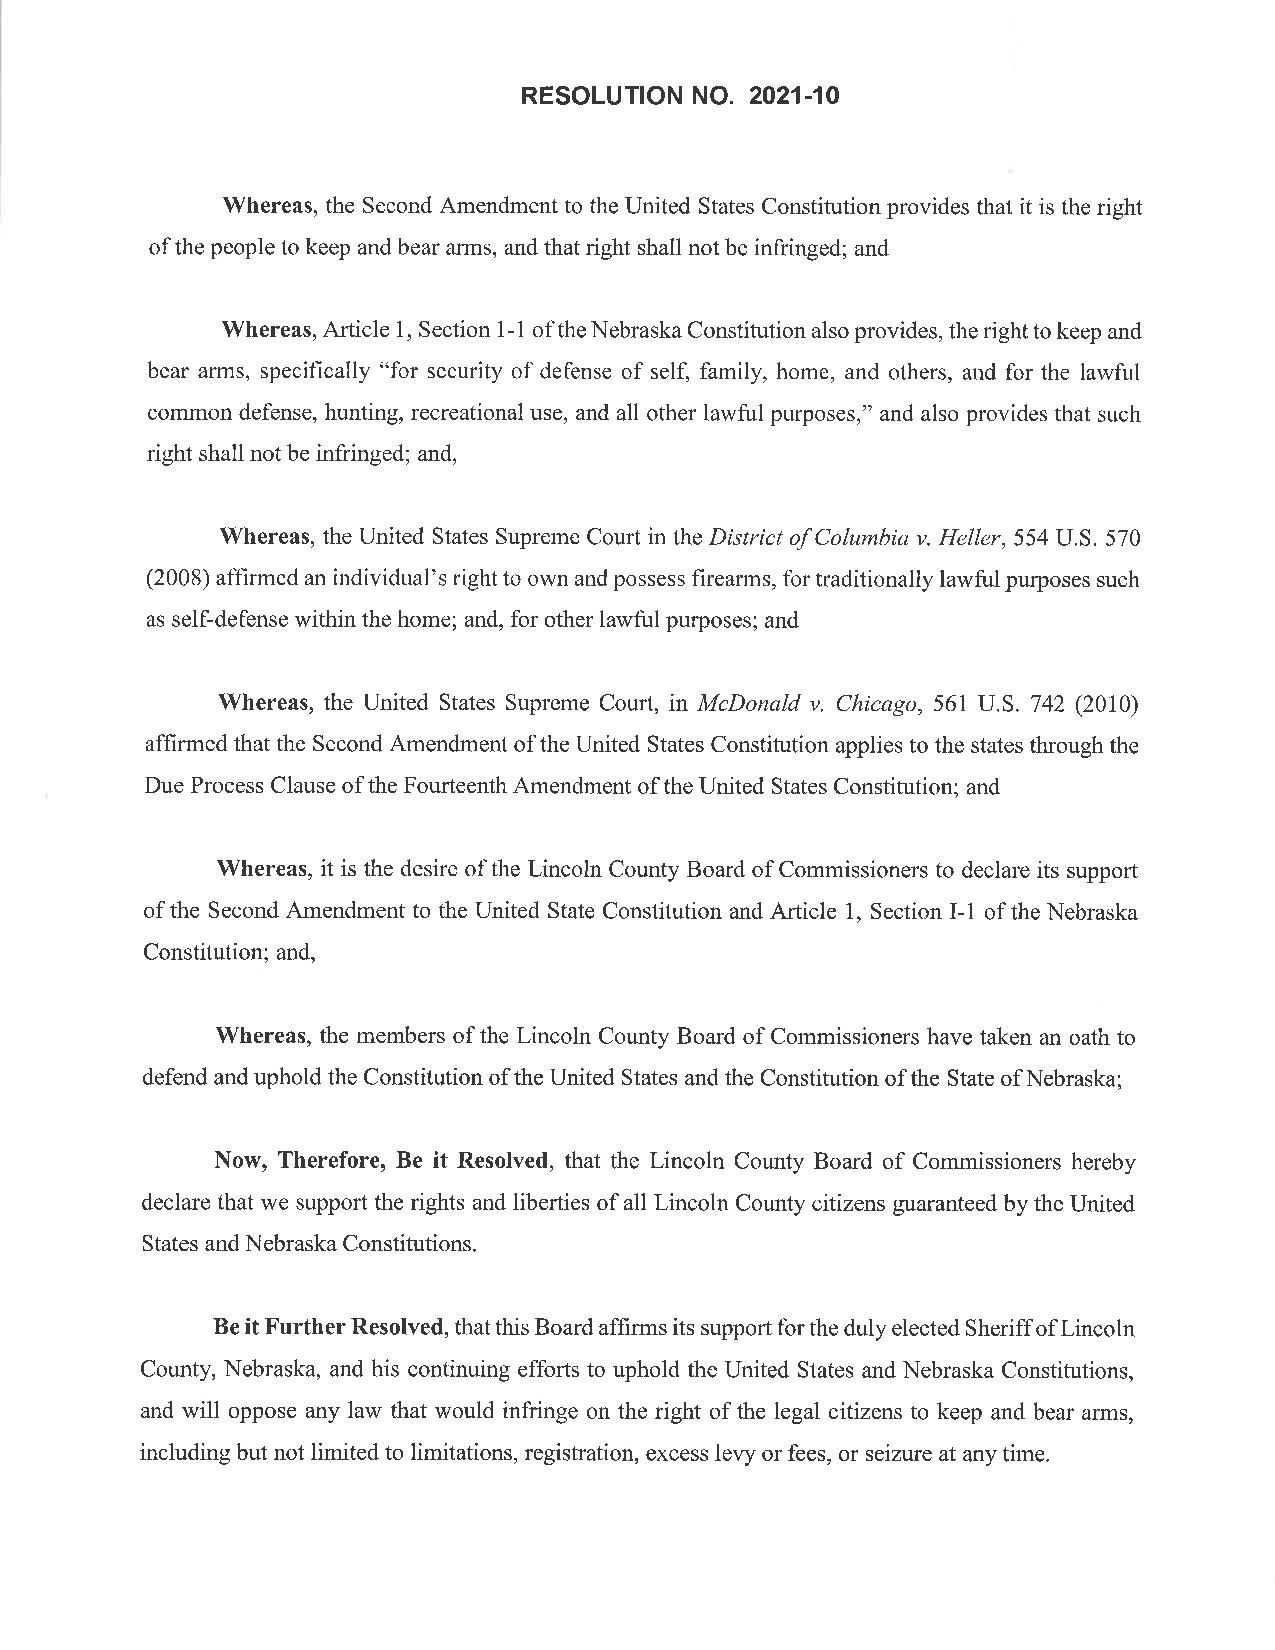 Lincoln County Nebraska Resolution Page 1